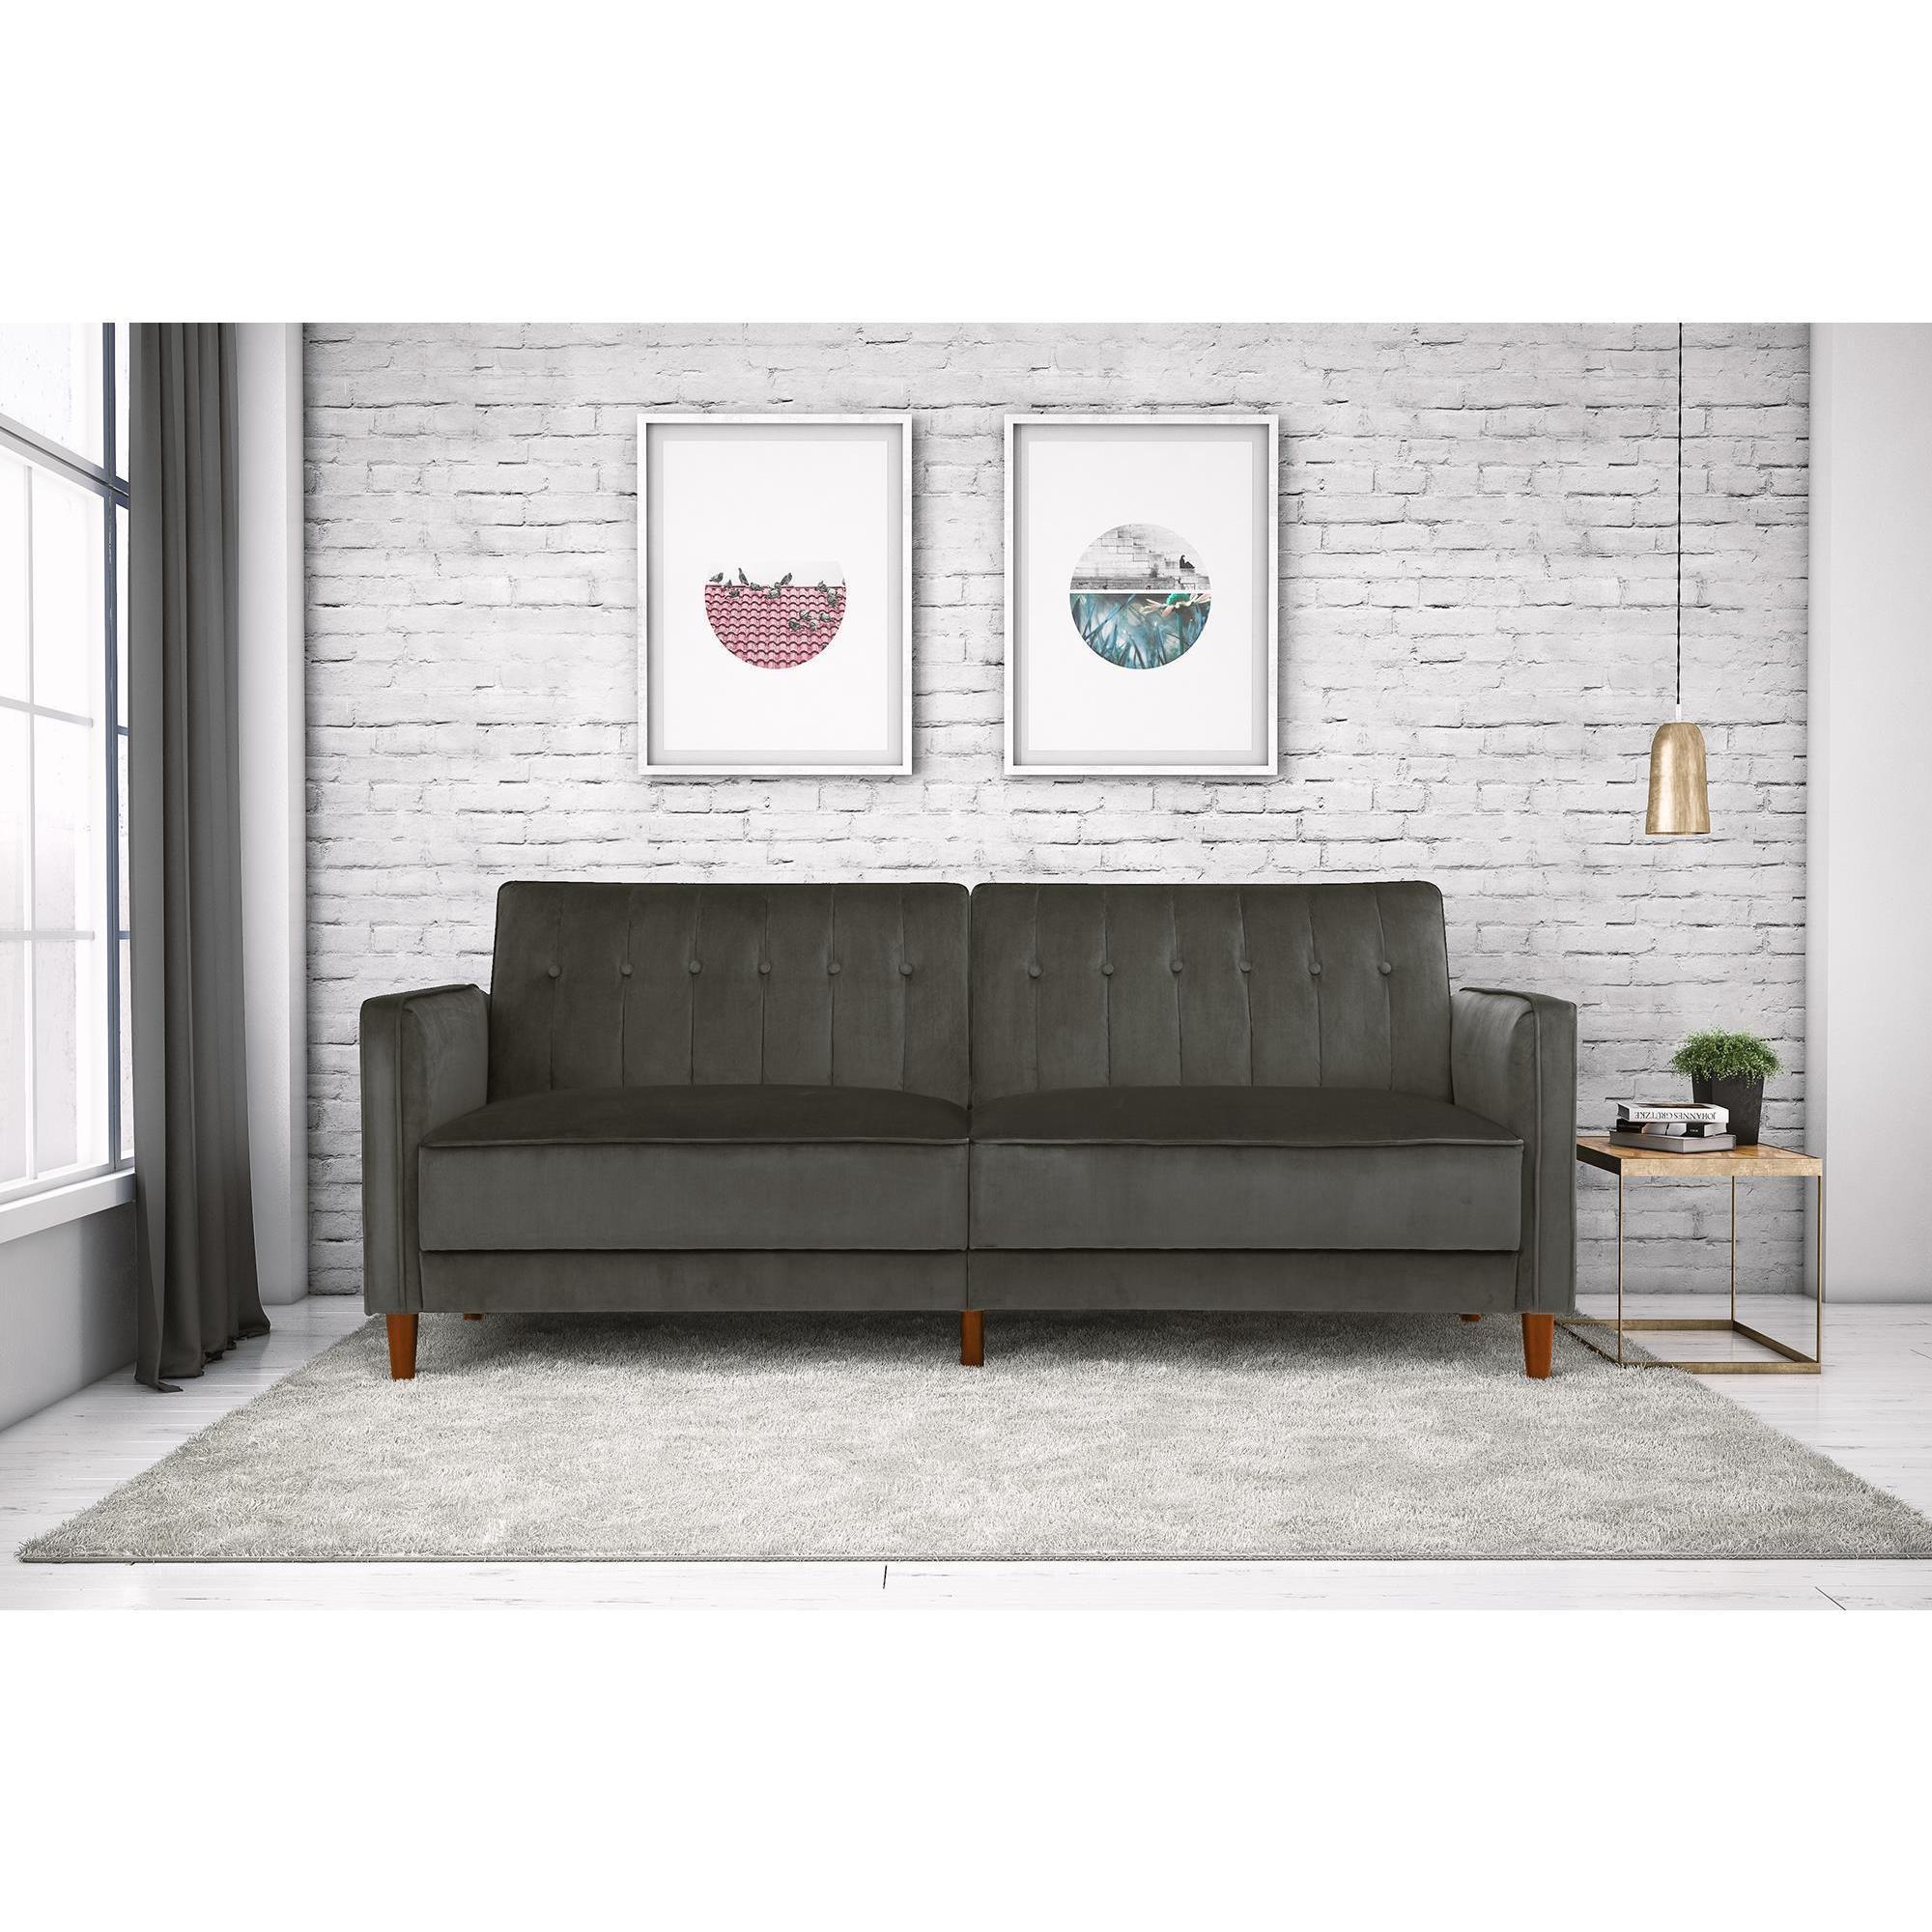 DHP Pin Tufted Velvet Convertible Futon Sofa - Free Shipping On ...